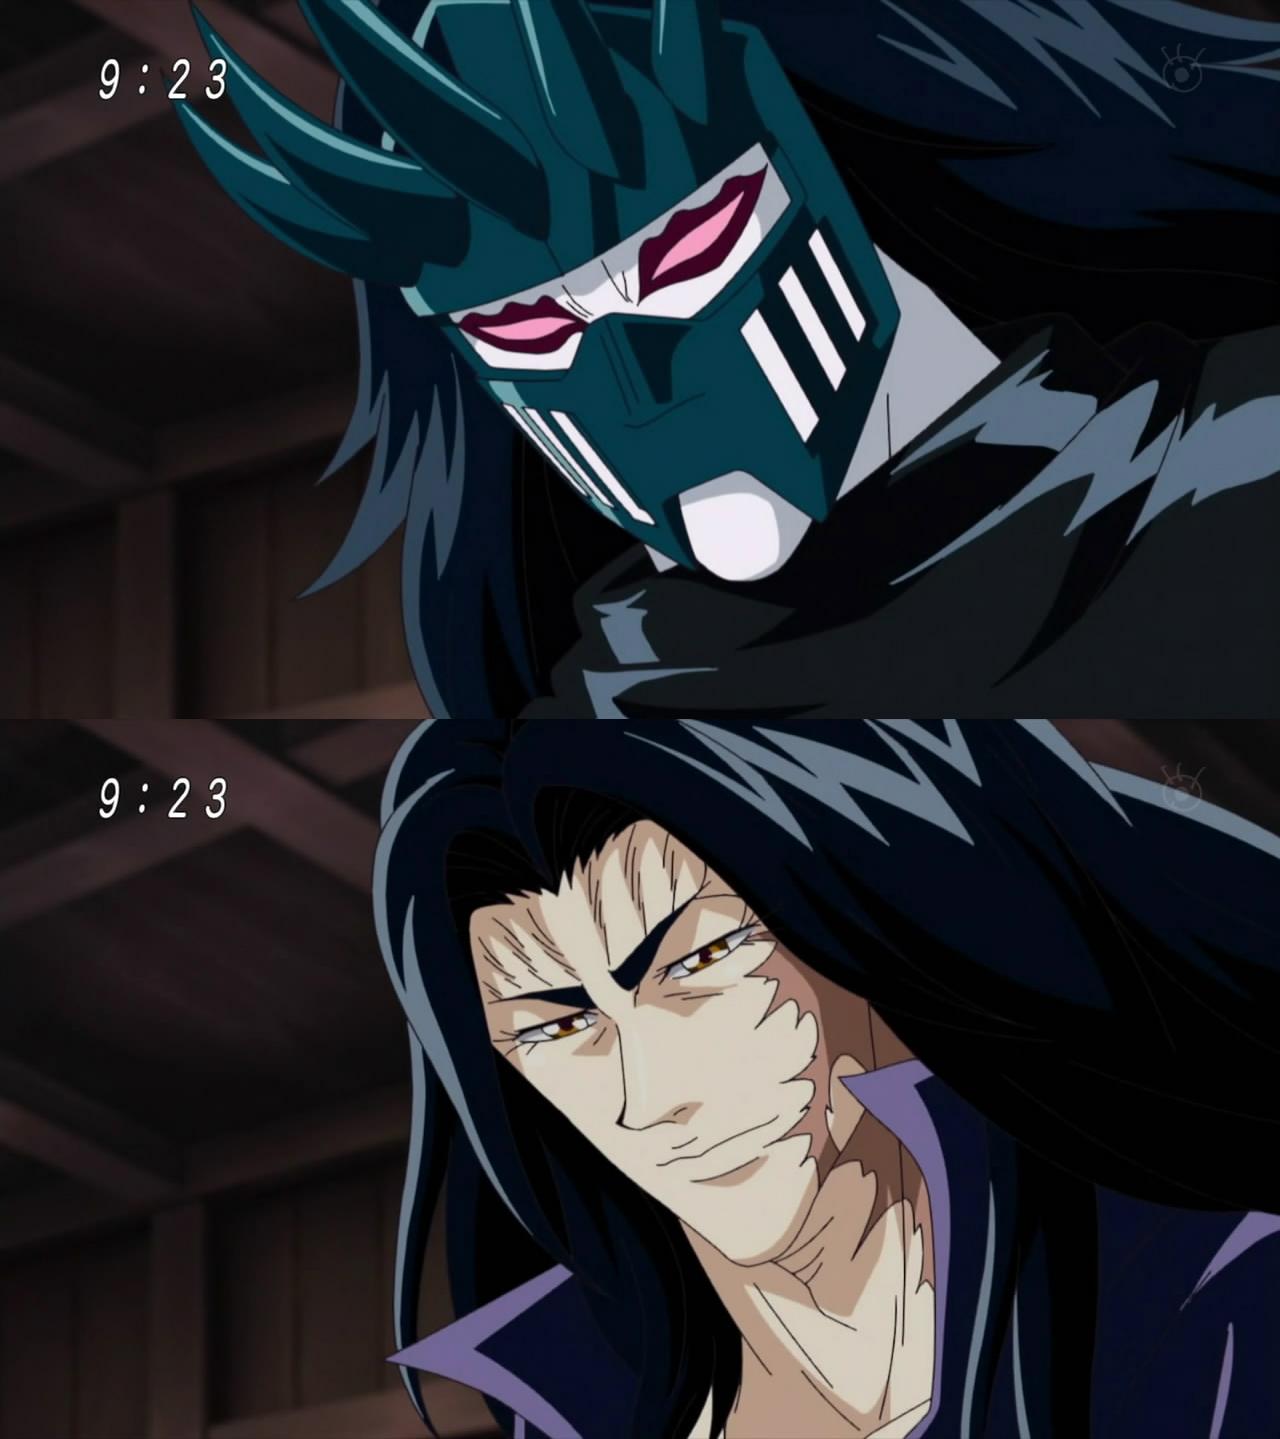 Toriko Angry At Starjun Jpg: Image - Eps 71 Starjun.jpg